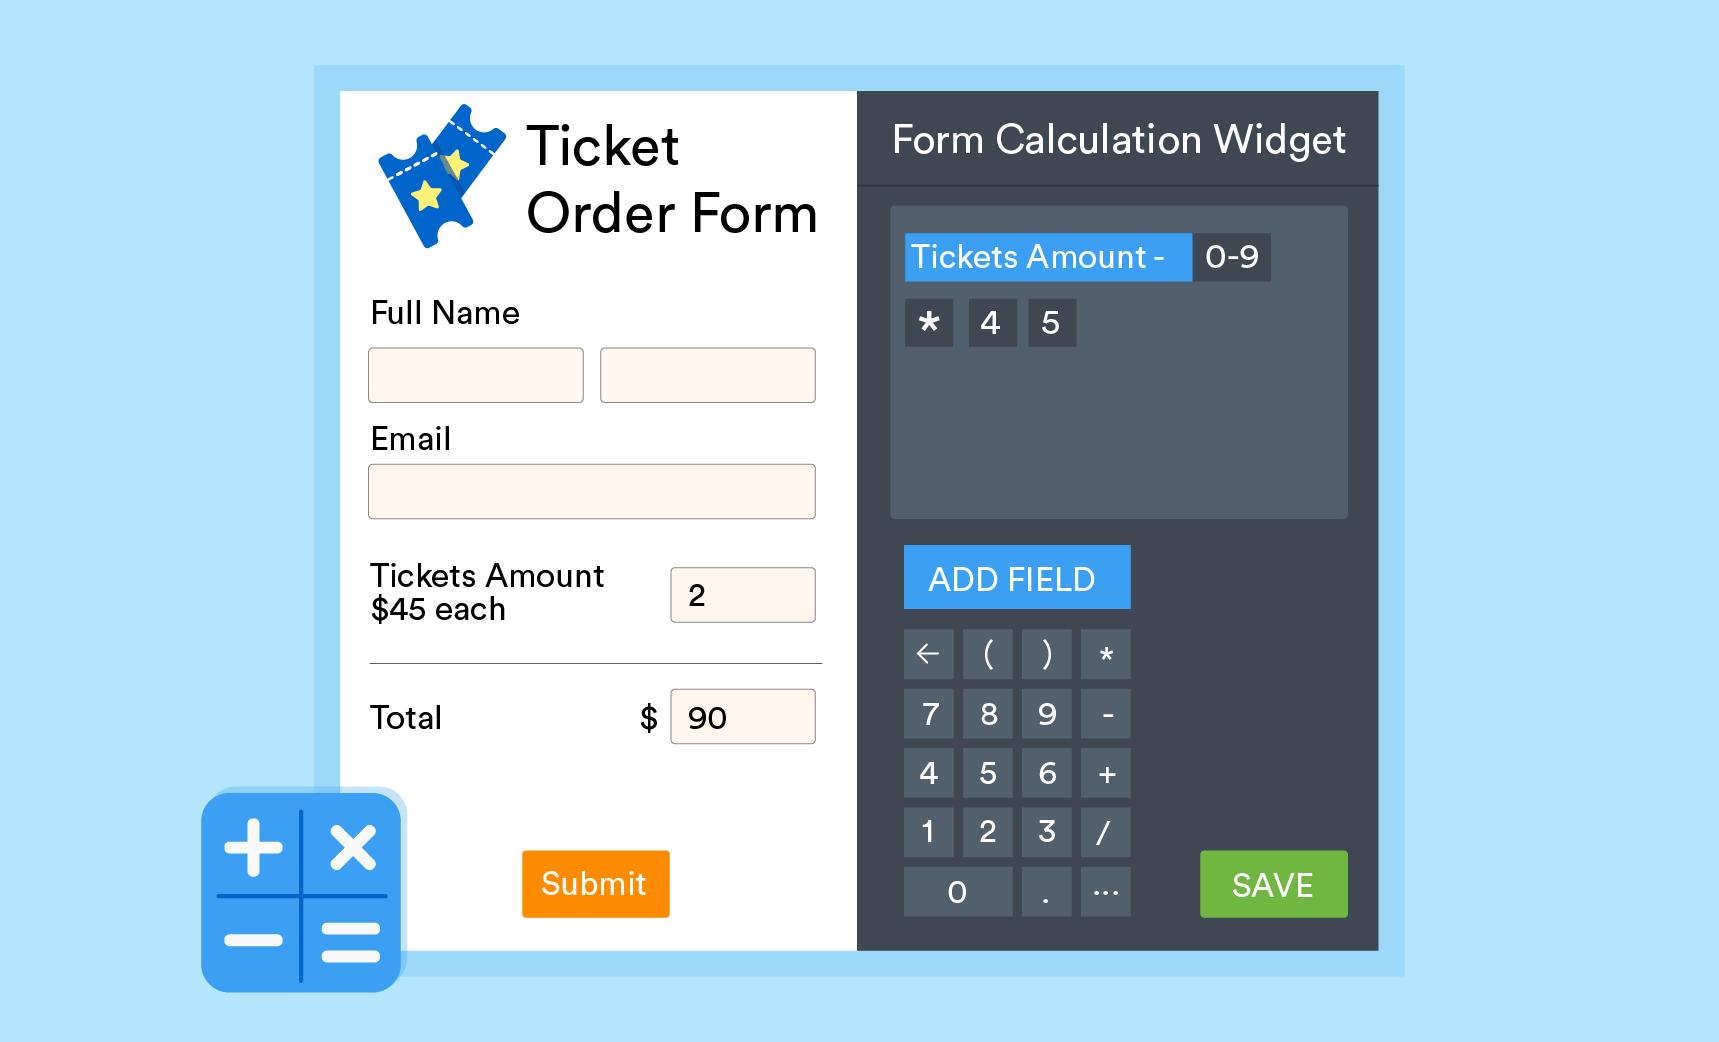 form calculation widget